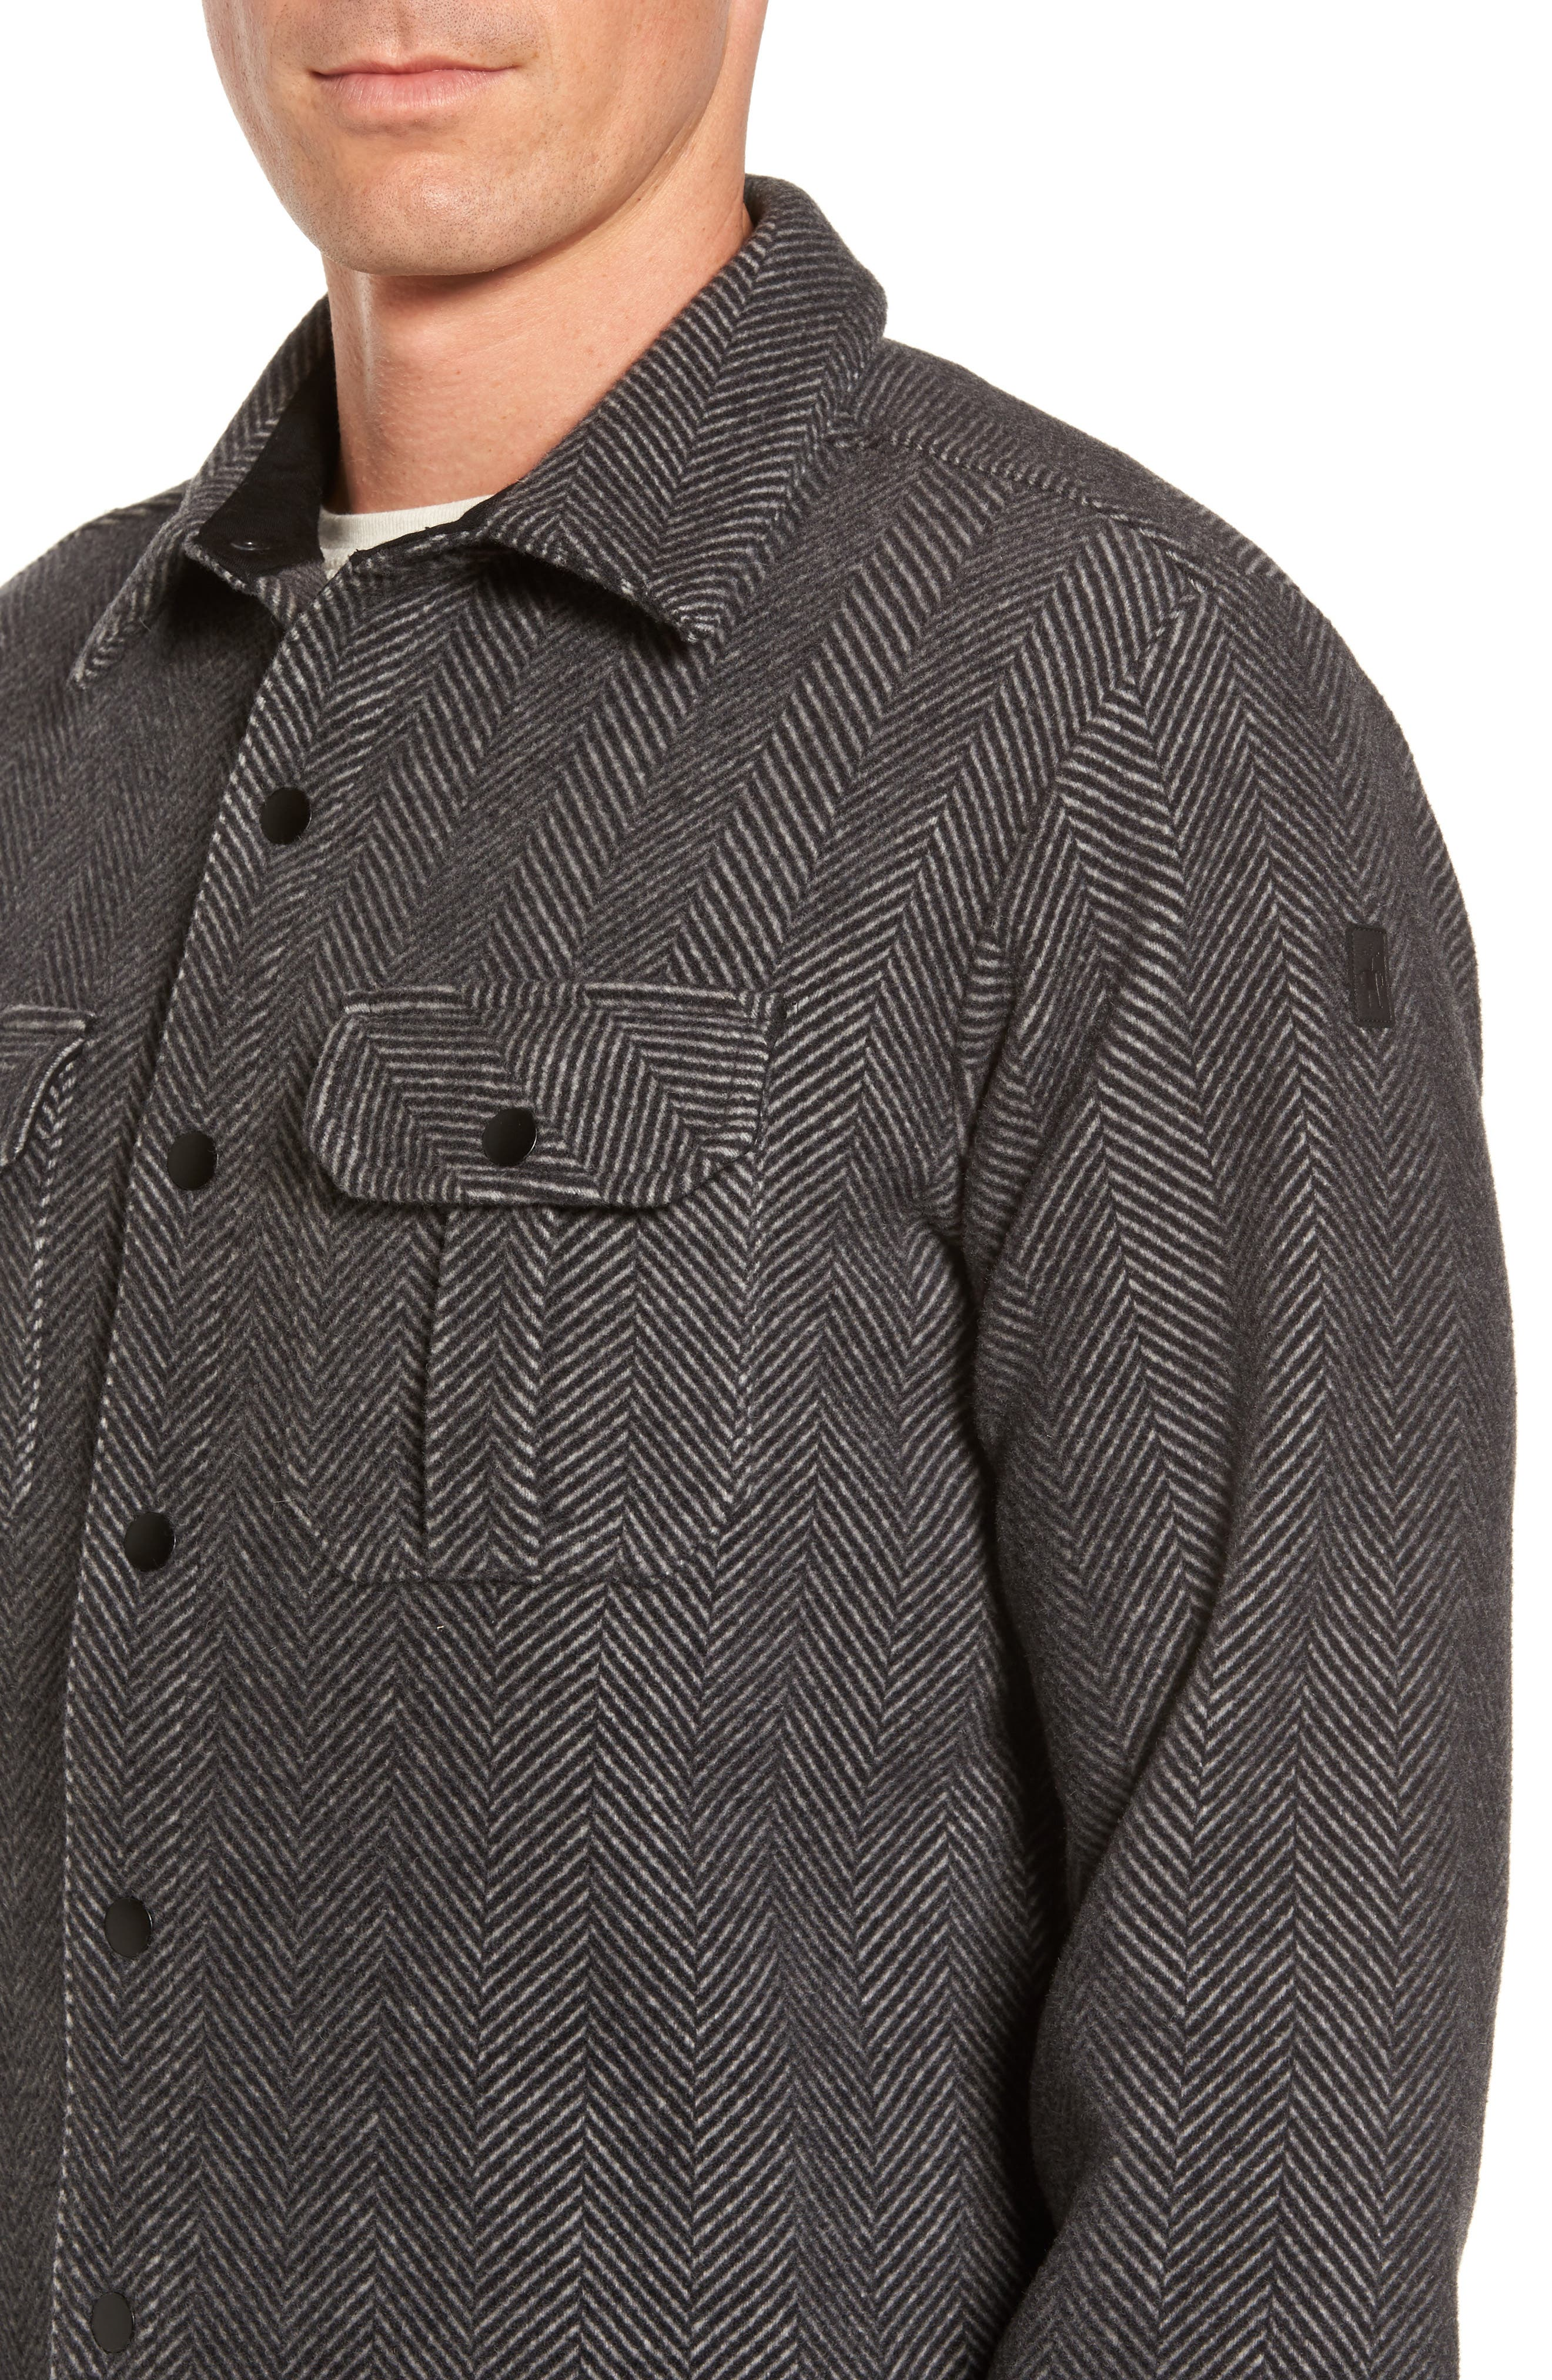 Anchor Line Herringbone Wool Blend Shirt Jacket,                             Alternate thumbnail 4, color,                             Charcoal Heather